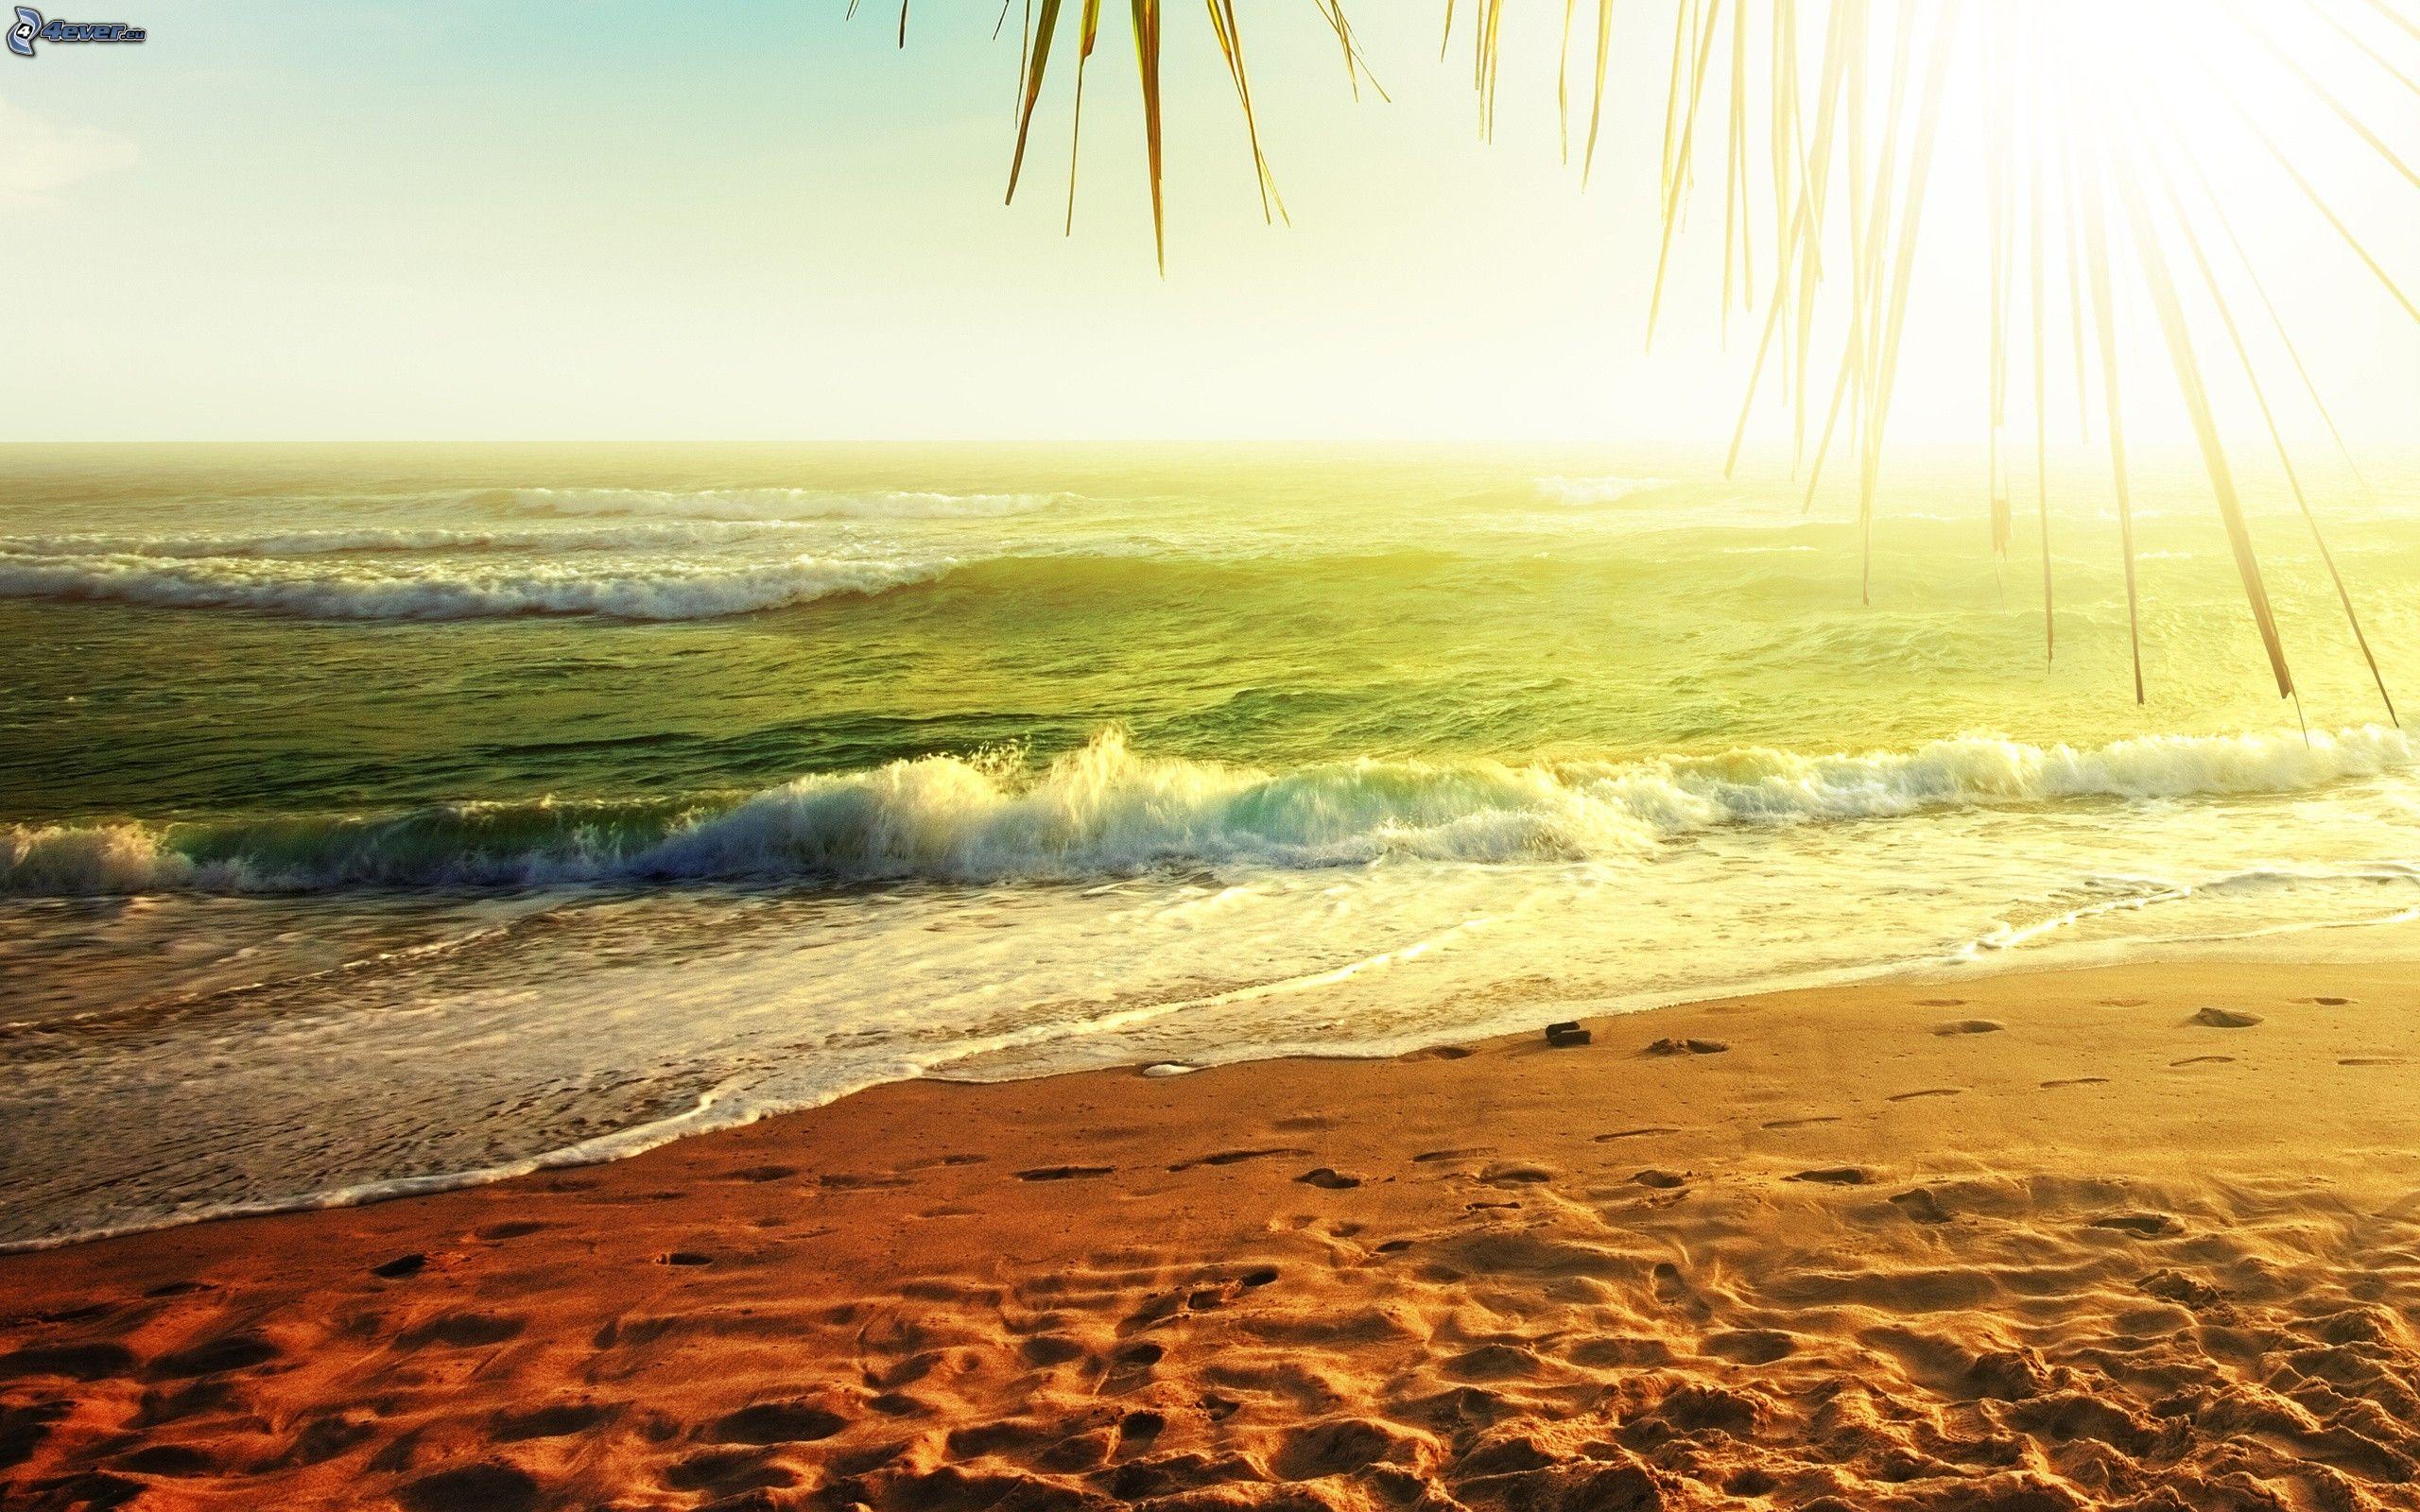 download di sol playa y arena // loyringliso ga